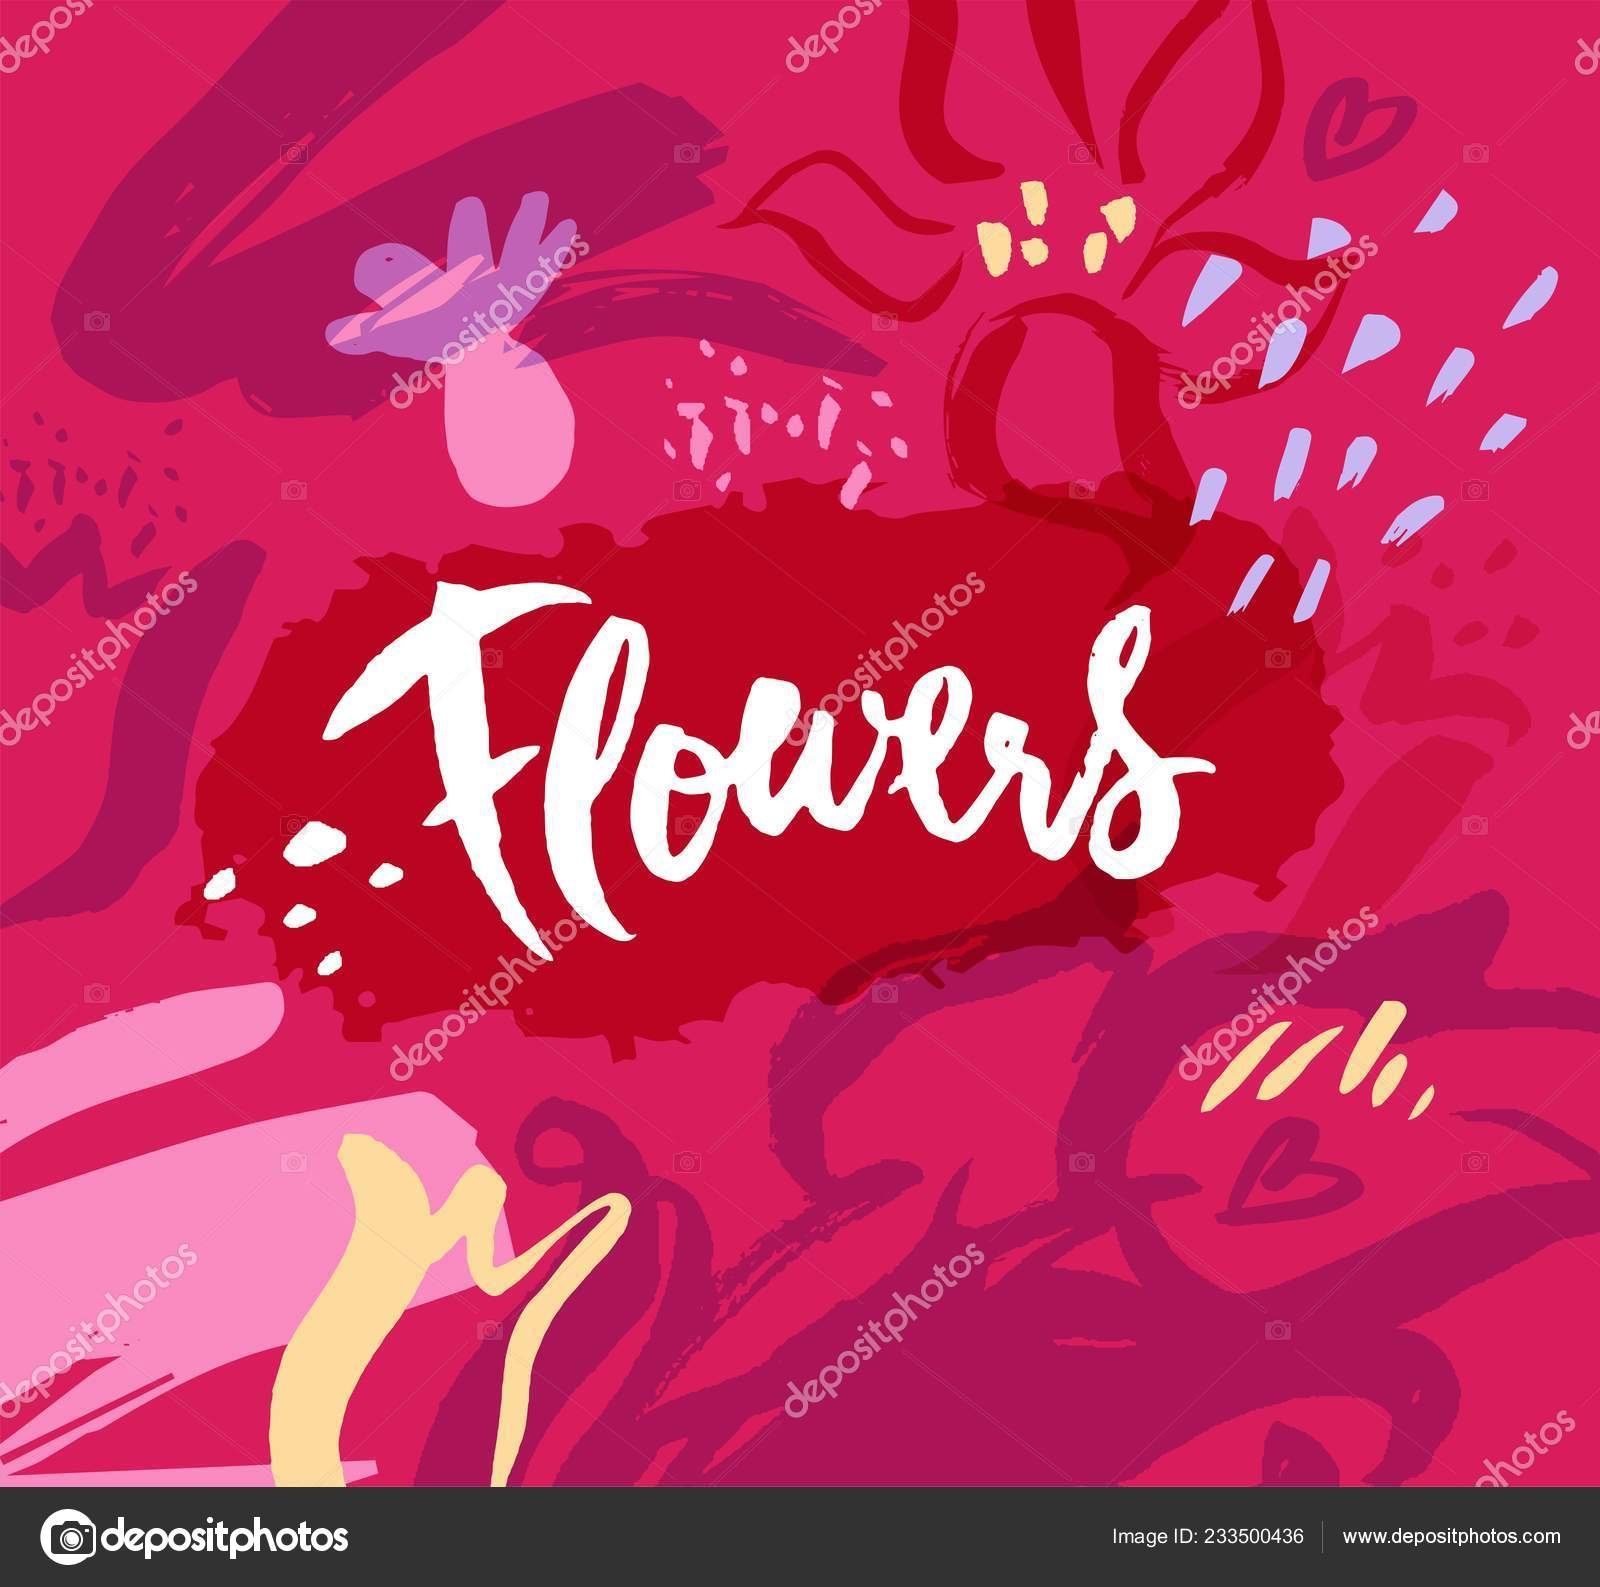 Patrón Floral Abstracto Con Texturas Dibujadas Mano Letras